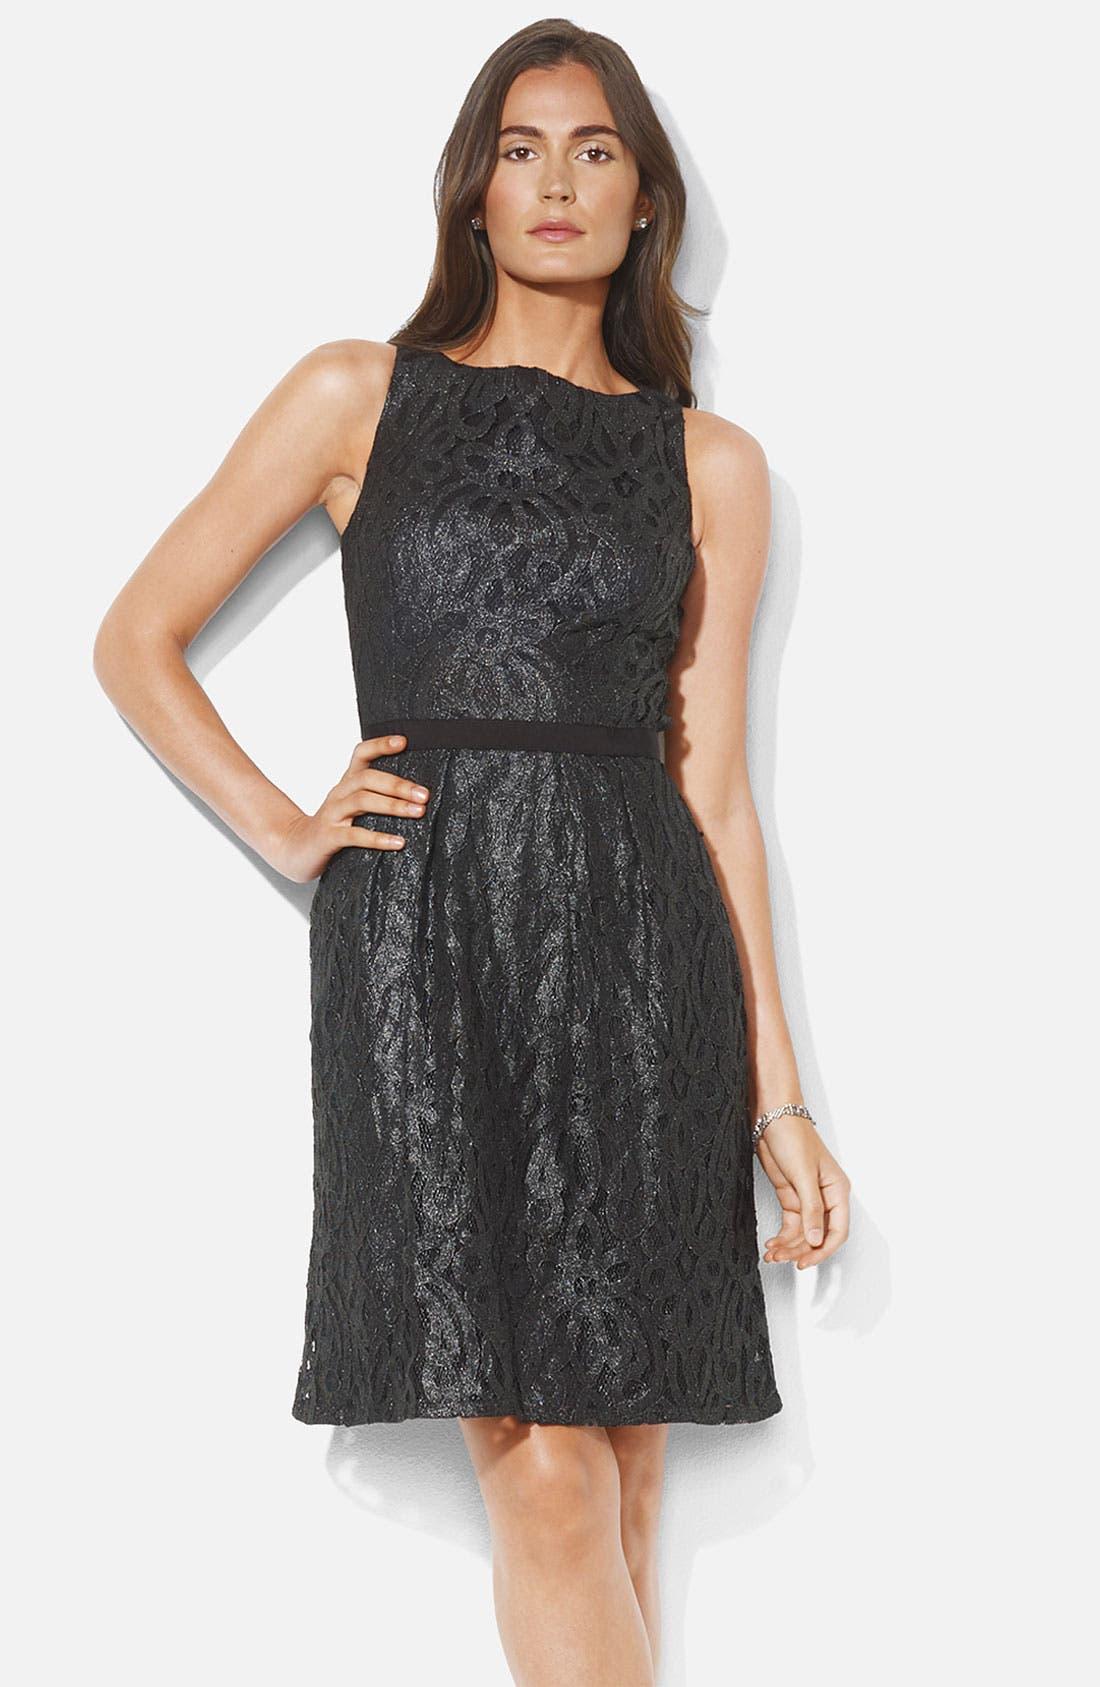 Alternate Image 1 Selected - Lauren Ralph Lauren Bateau Neck Metallic Lace Dress (Petite)